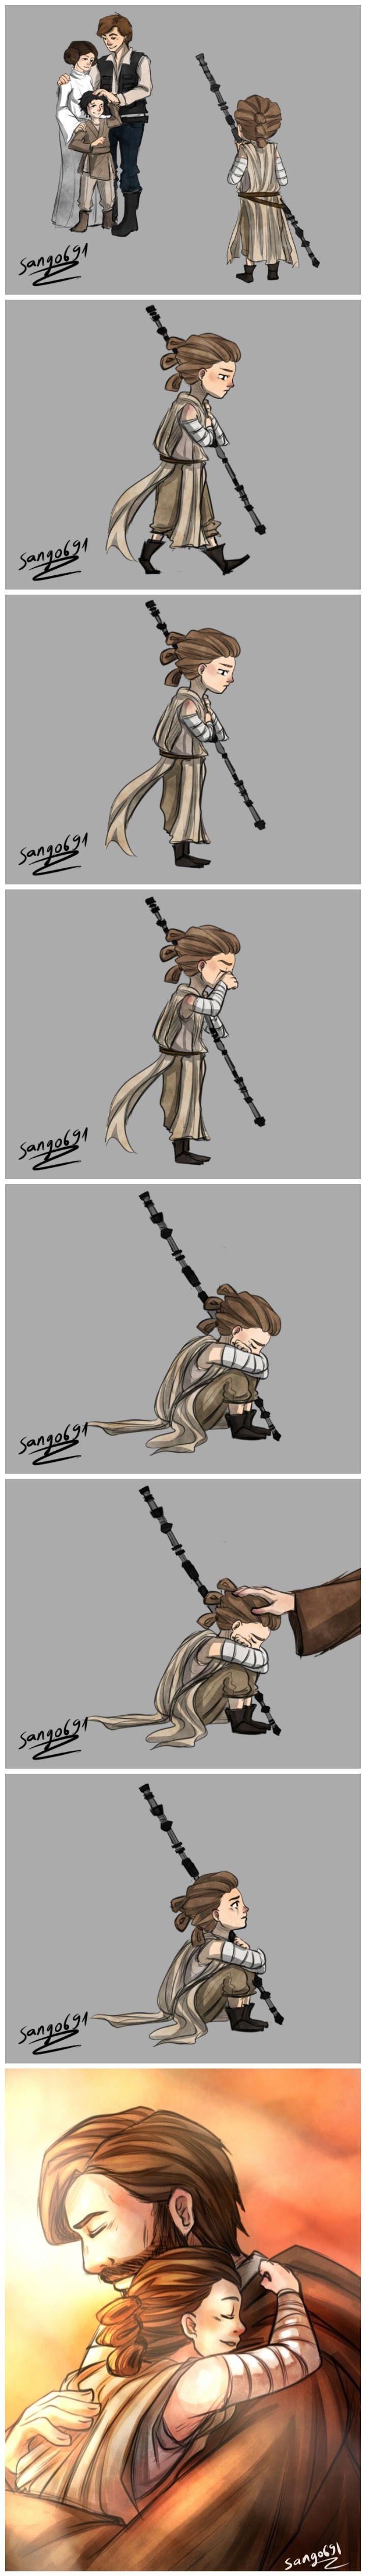 "a little comics ""kenobi's family "" I really hope Rey is Obi-wan's graddaugther because for me she looks like Obi wan ."